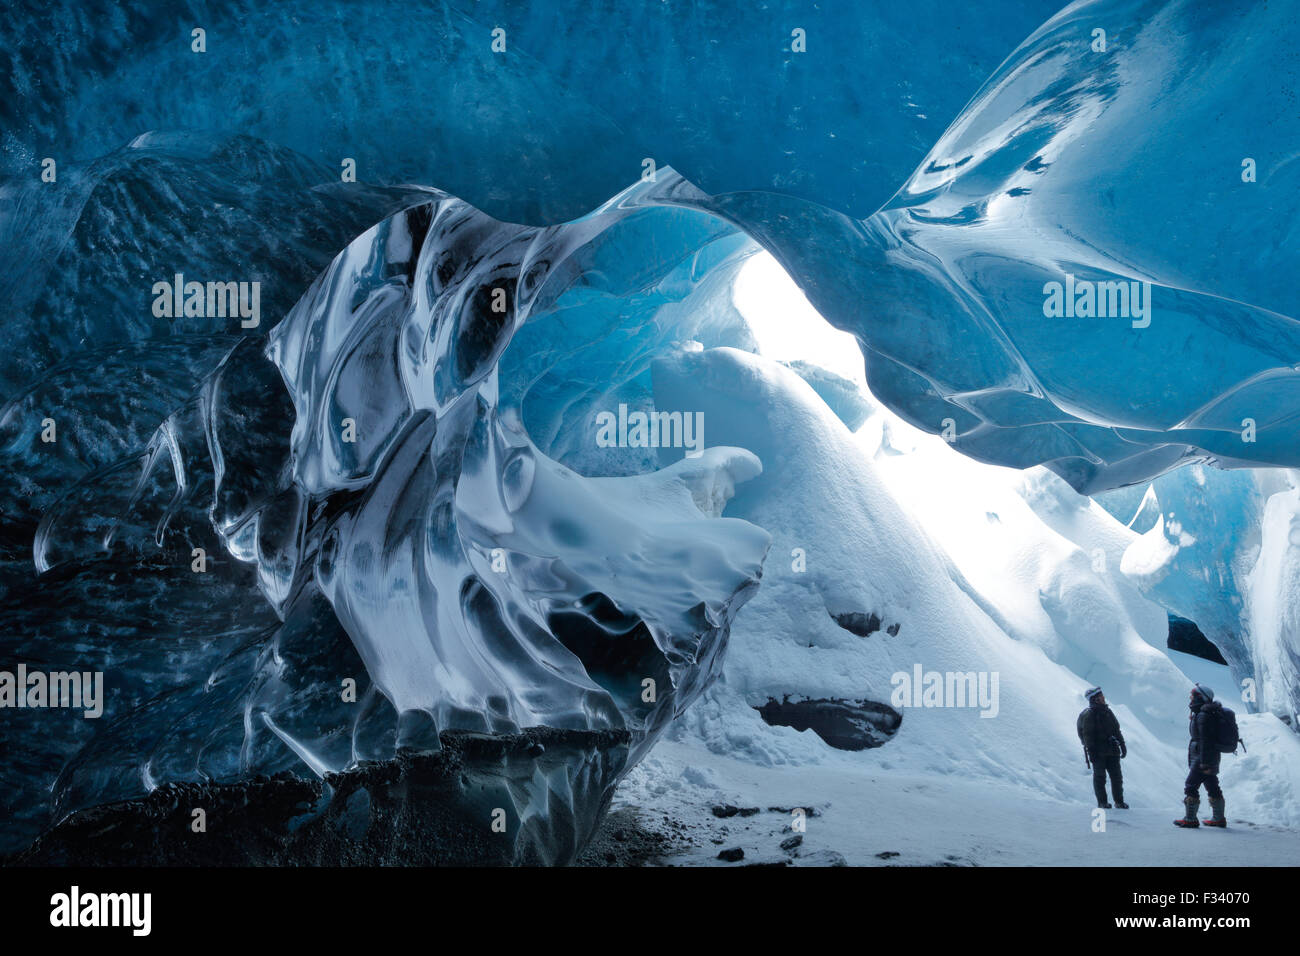 an ice cave beneath the Breidemerkurjokull glacier, eastern Iceland - Stock Image